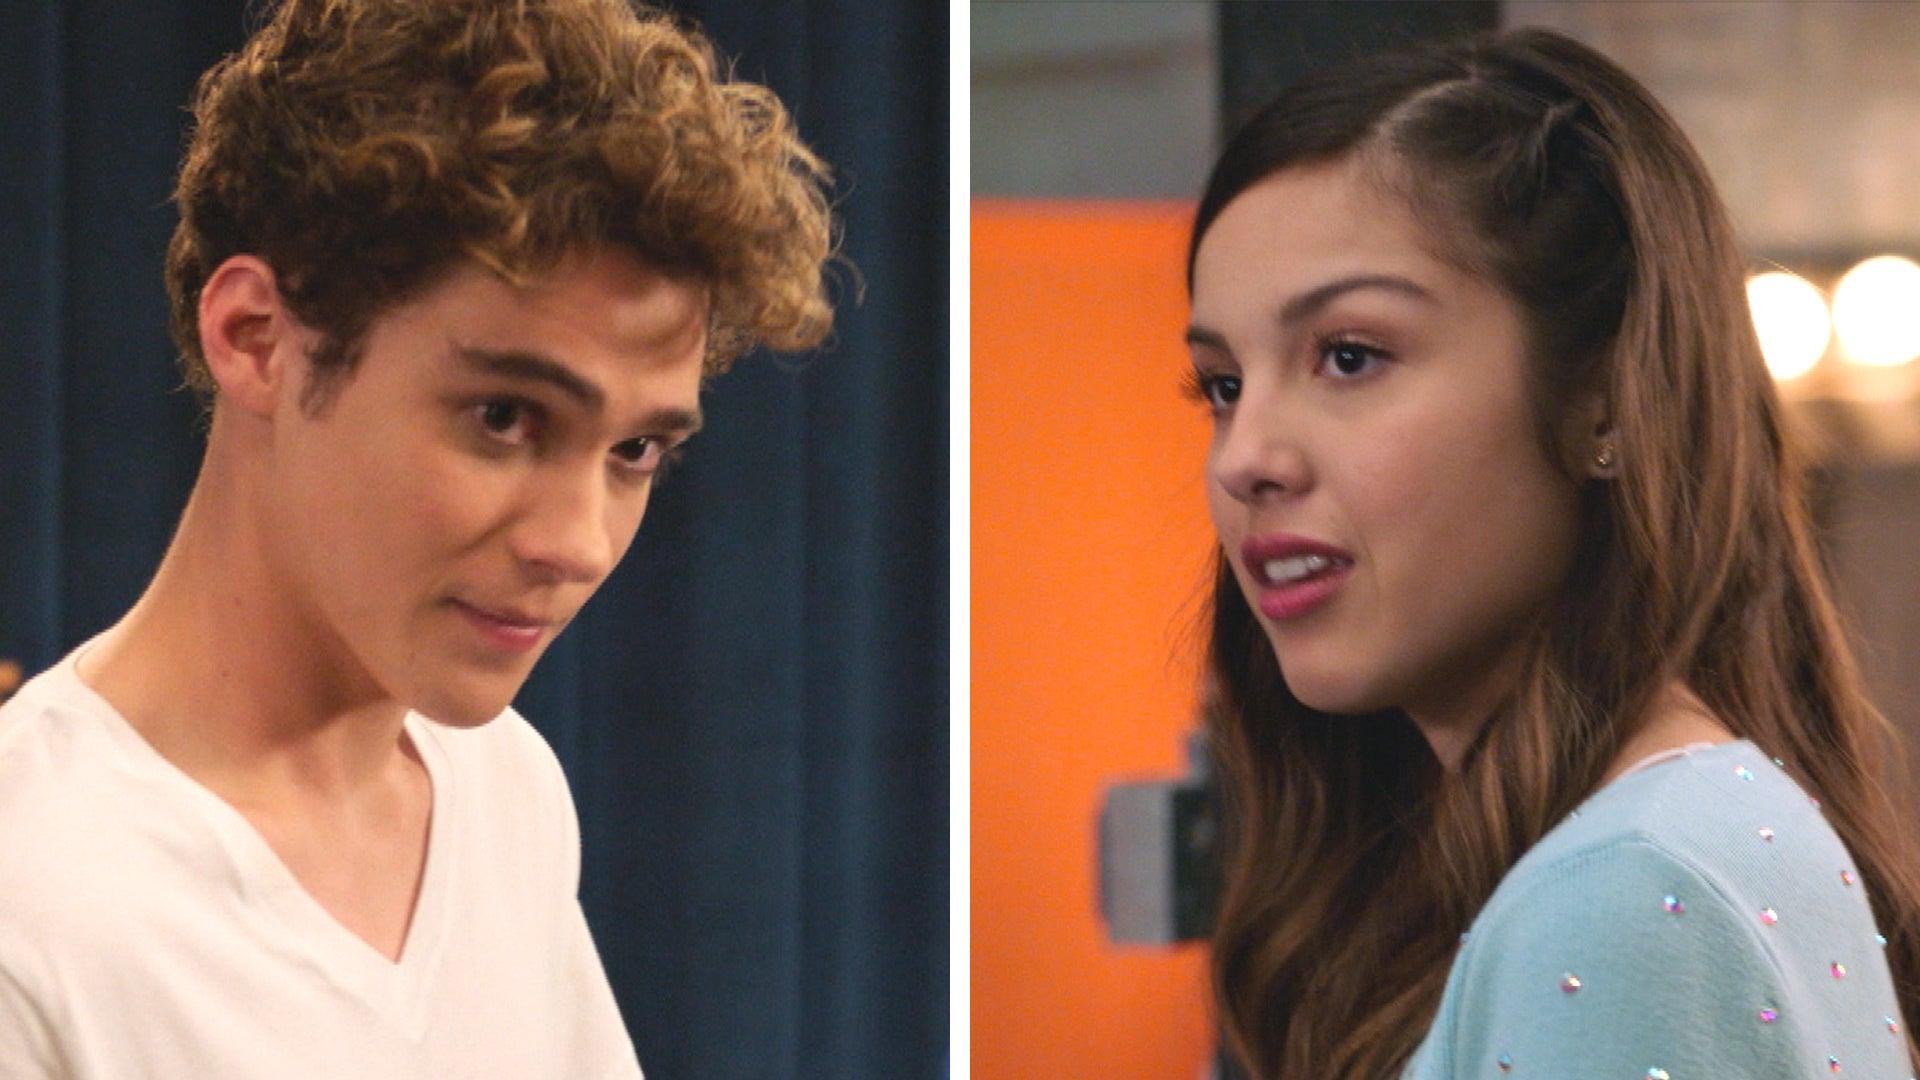 Hsm Tm Ts Stars Joshua Bassett And Olivia Rodrigo On Ricky And Nini Romance Exclusive Entertainment Tonight